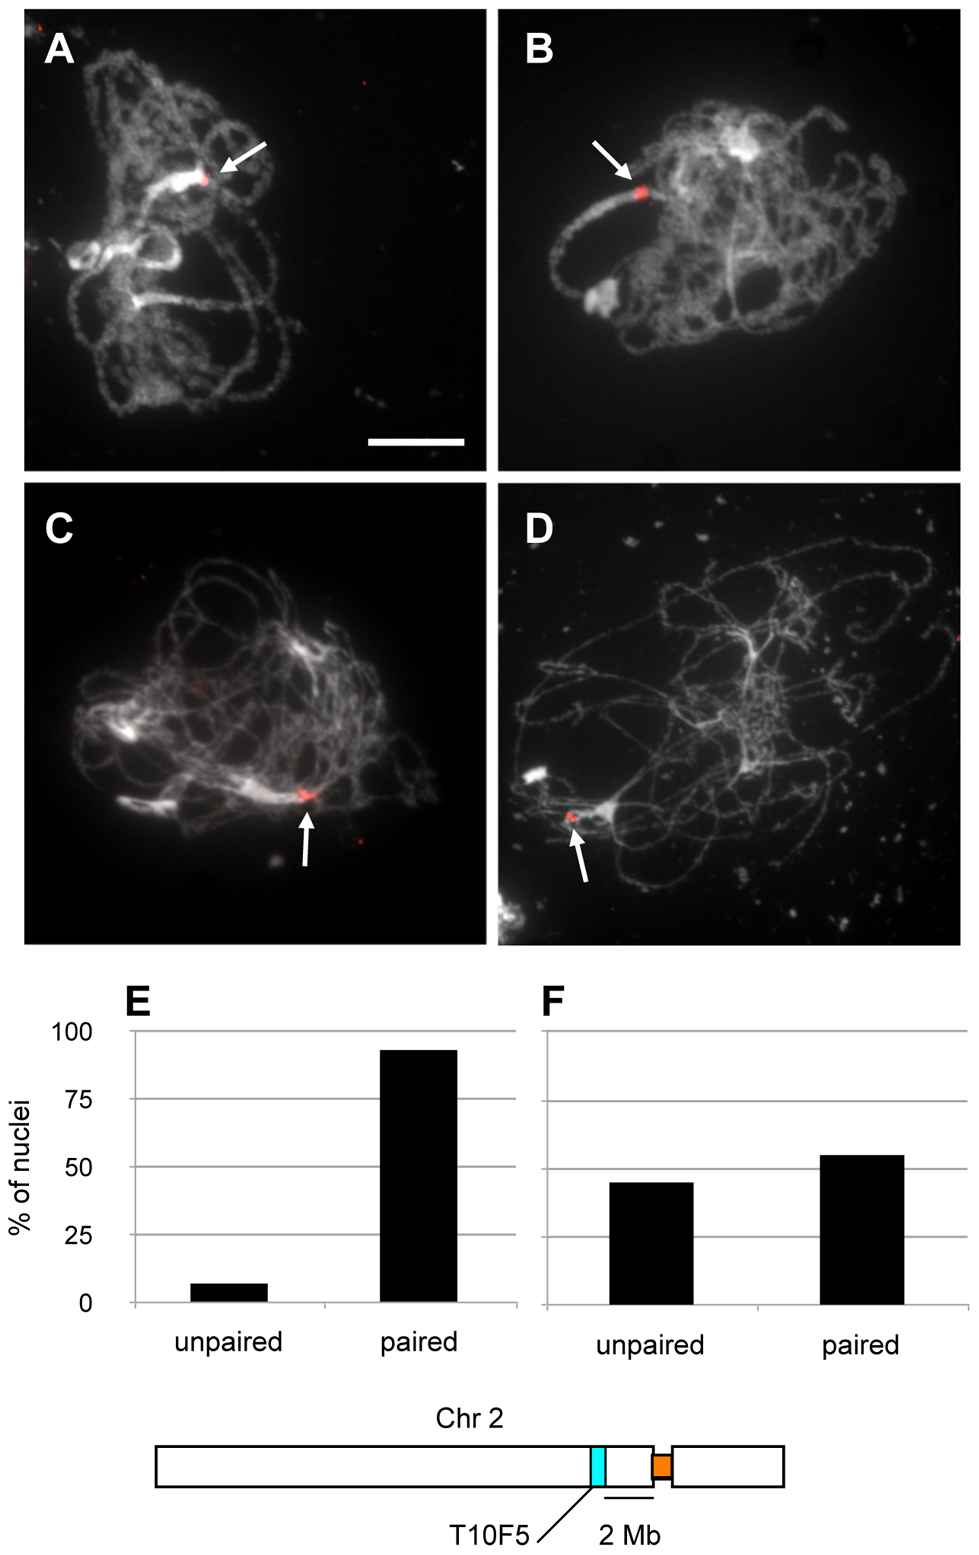 Homologous peri-centromeric pairing of chromosome 2 in <i>xrcc3</i> mutants.